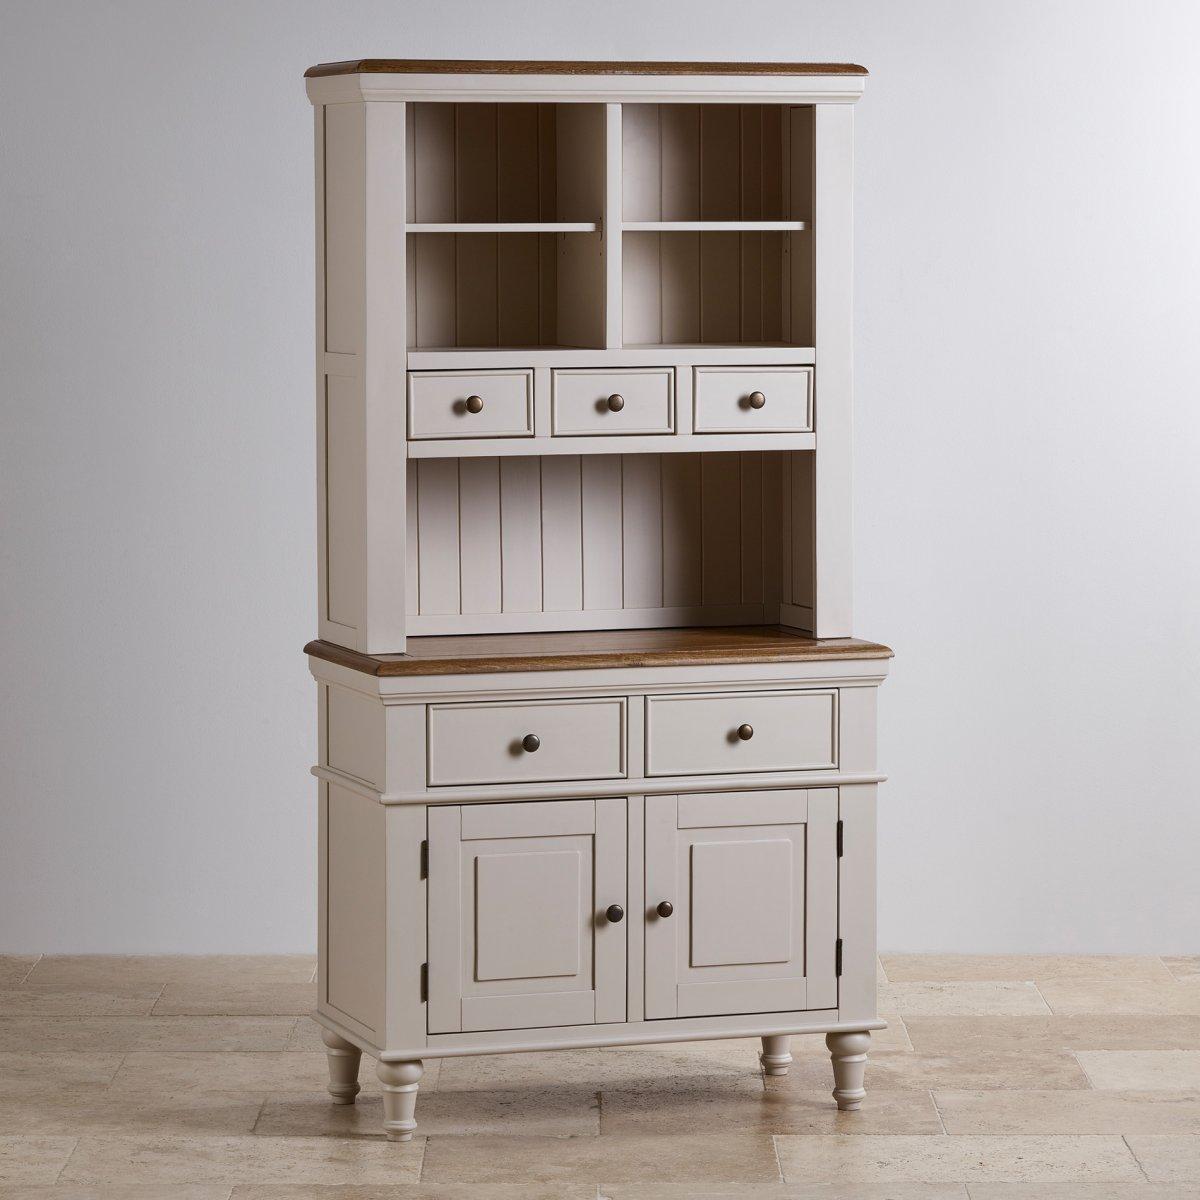 Shay Small Dresser in Painted Rustic Oak  Oak Furniture Land